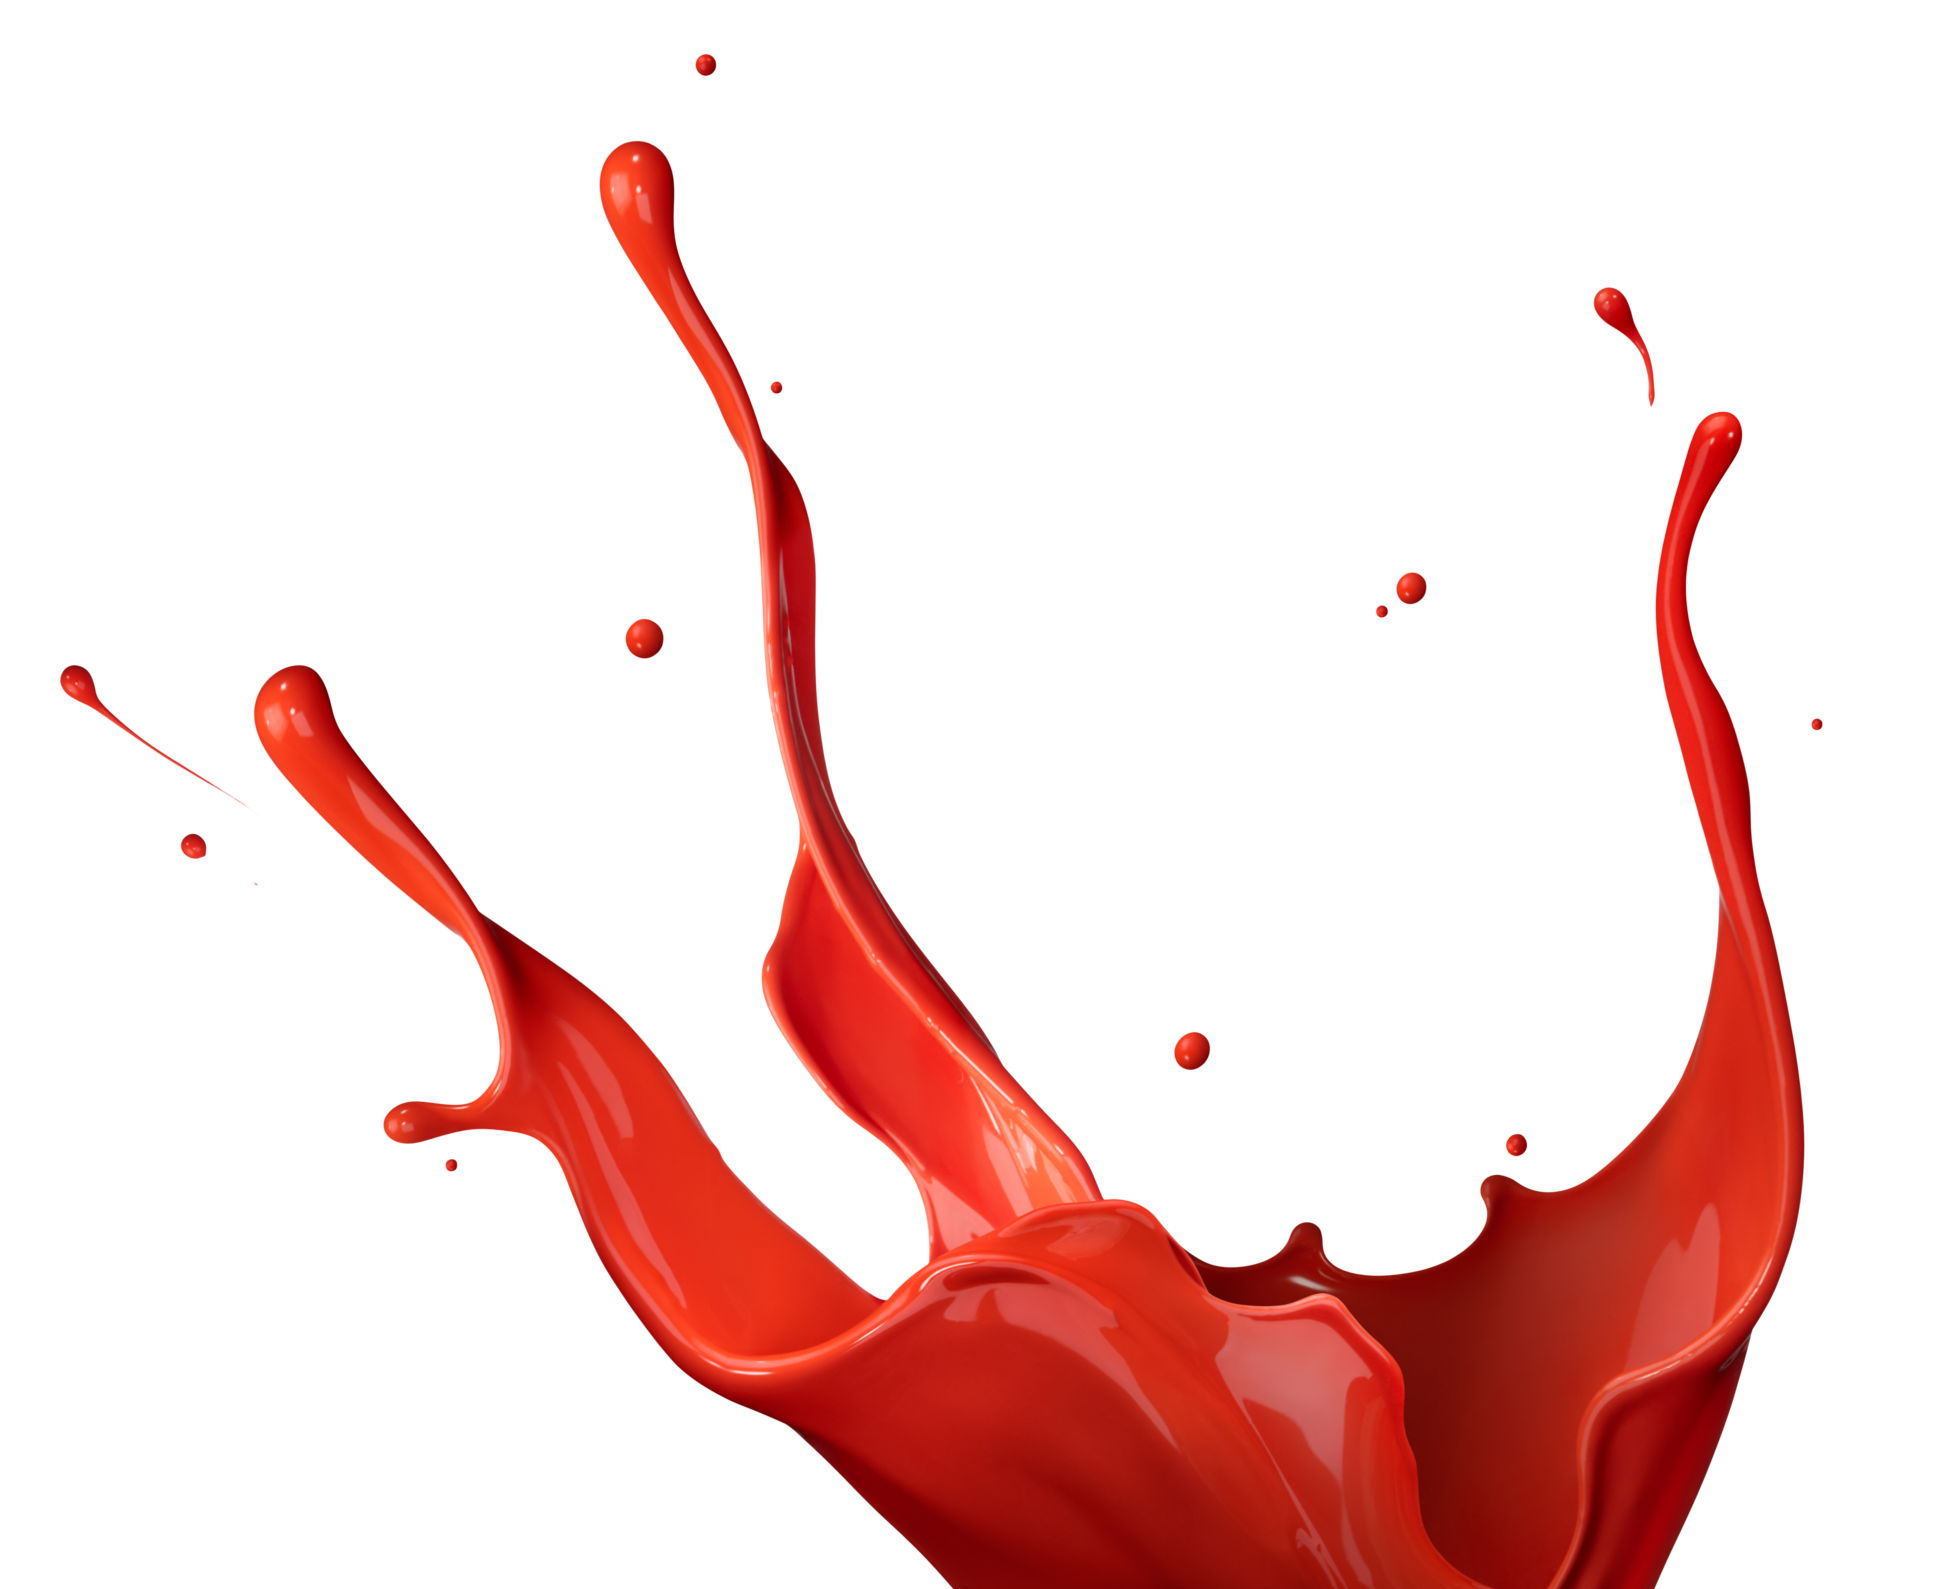 Red Paint Splatter Png Clipart Best Paint Splash Red Paint Custom Wall Murals